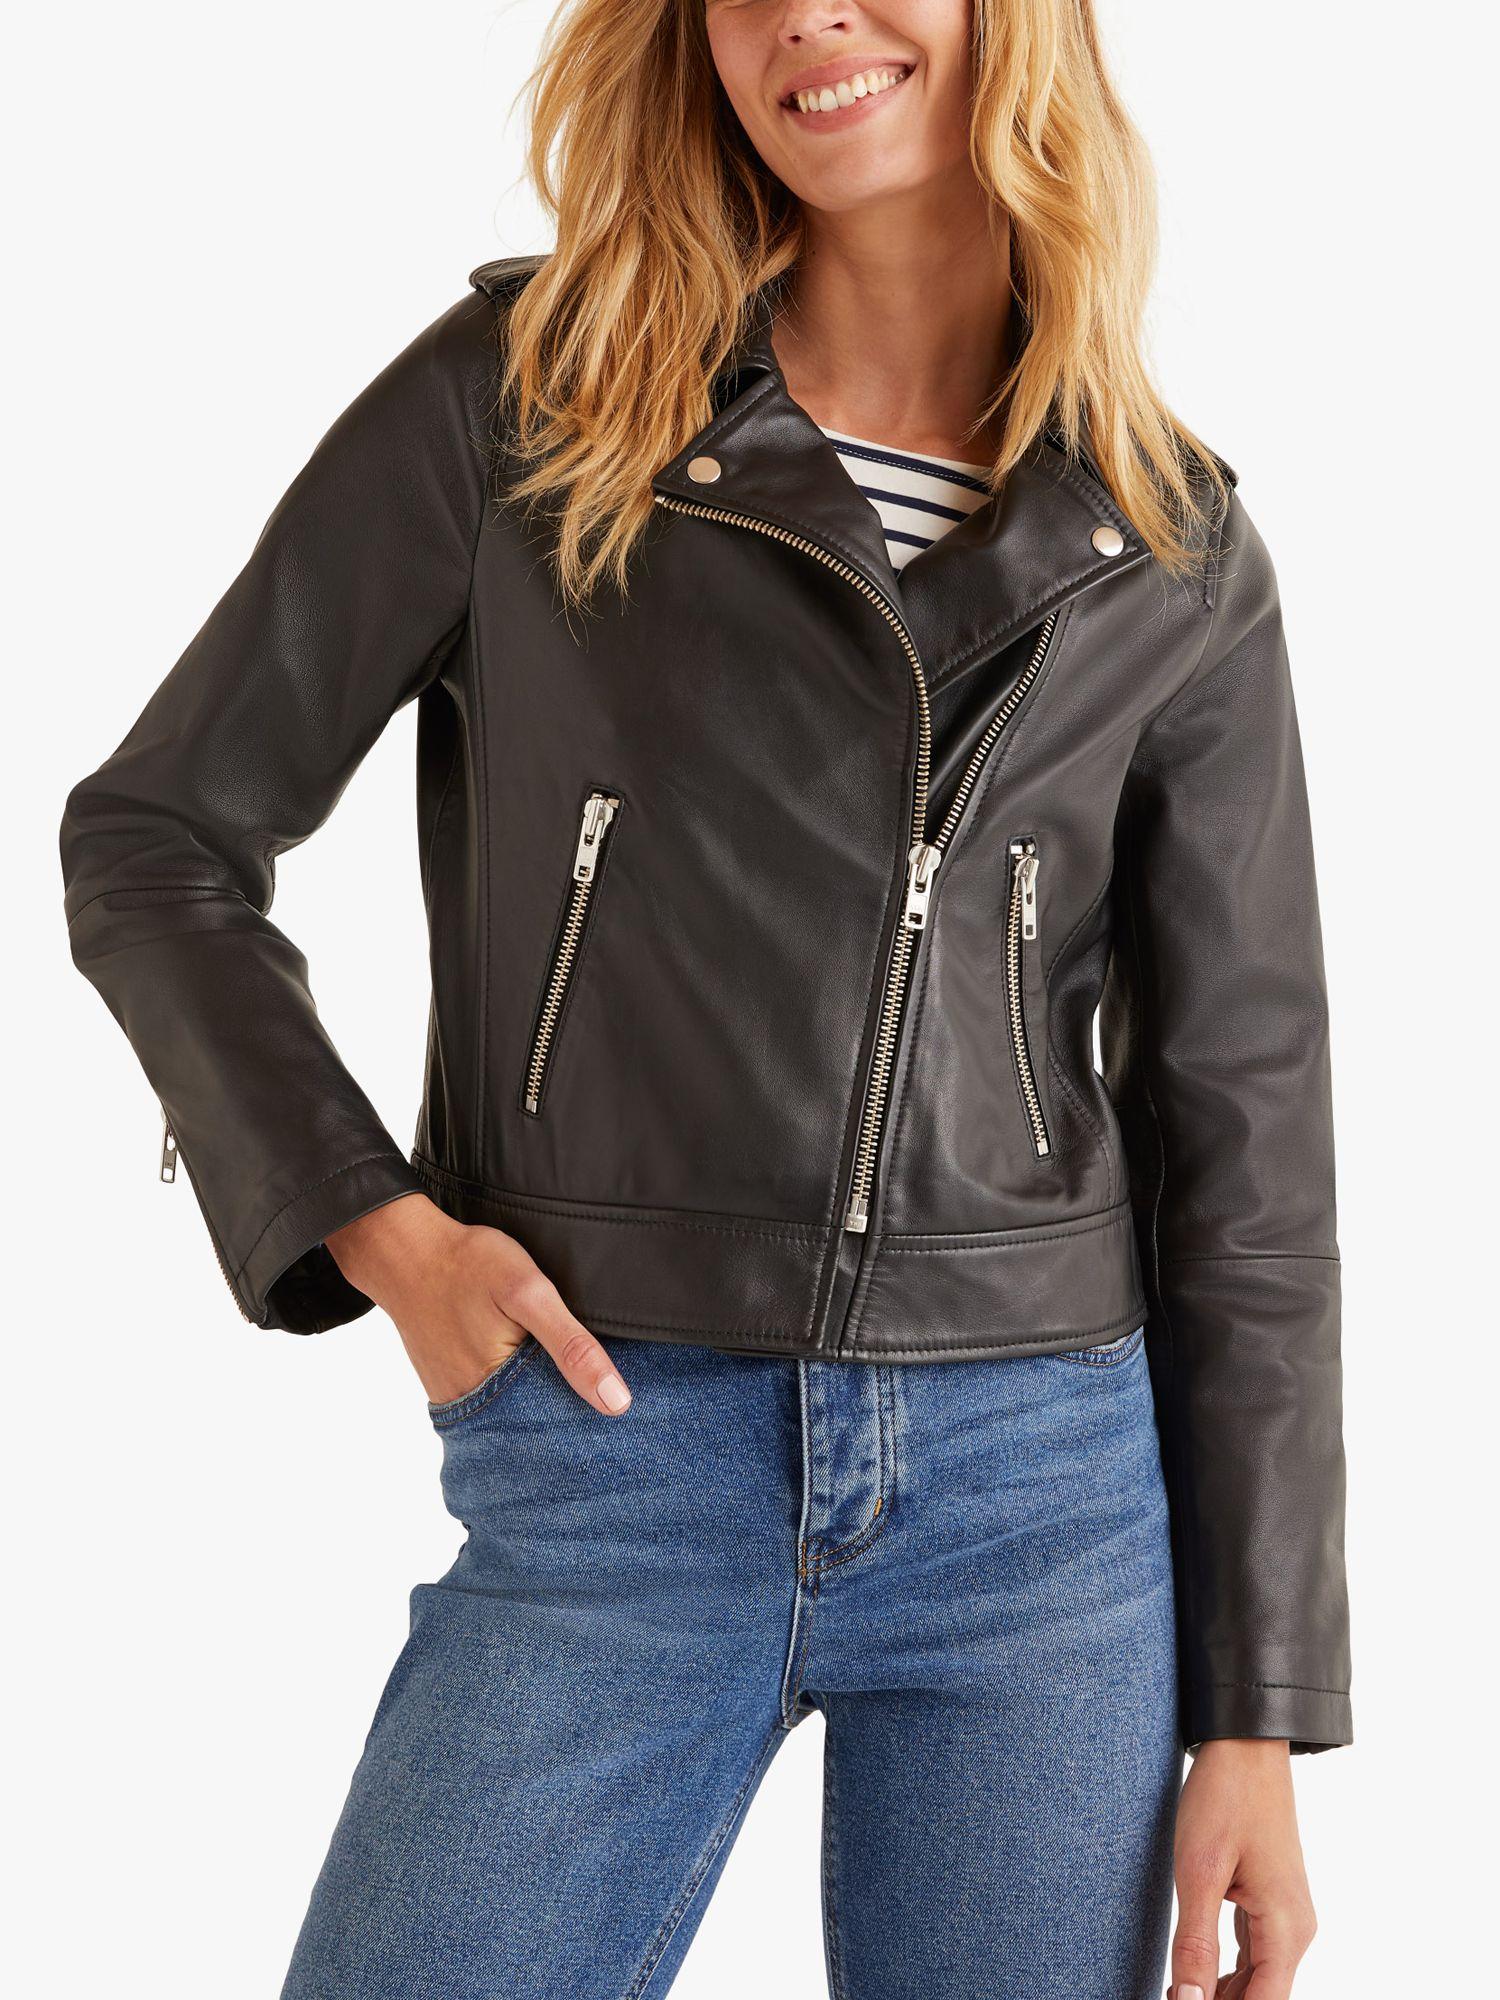 Boden Boden Morleigh Leather Jacket, Black